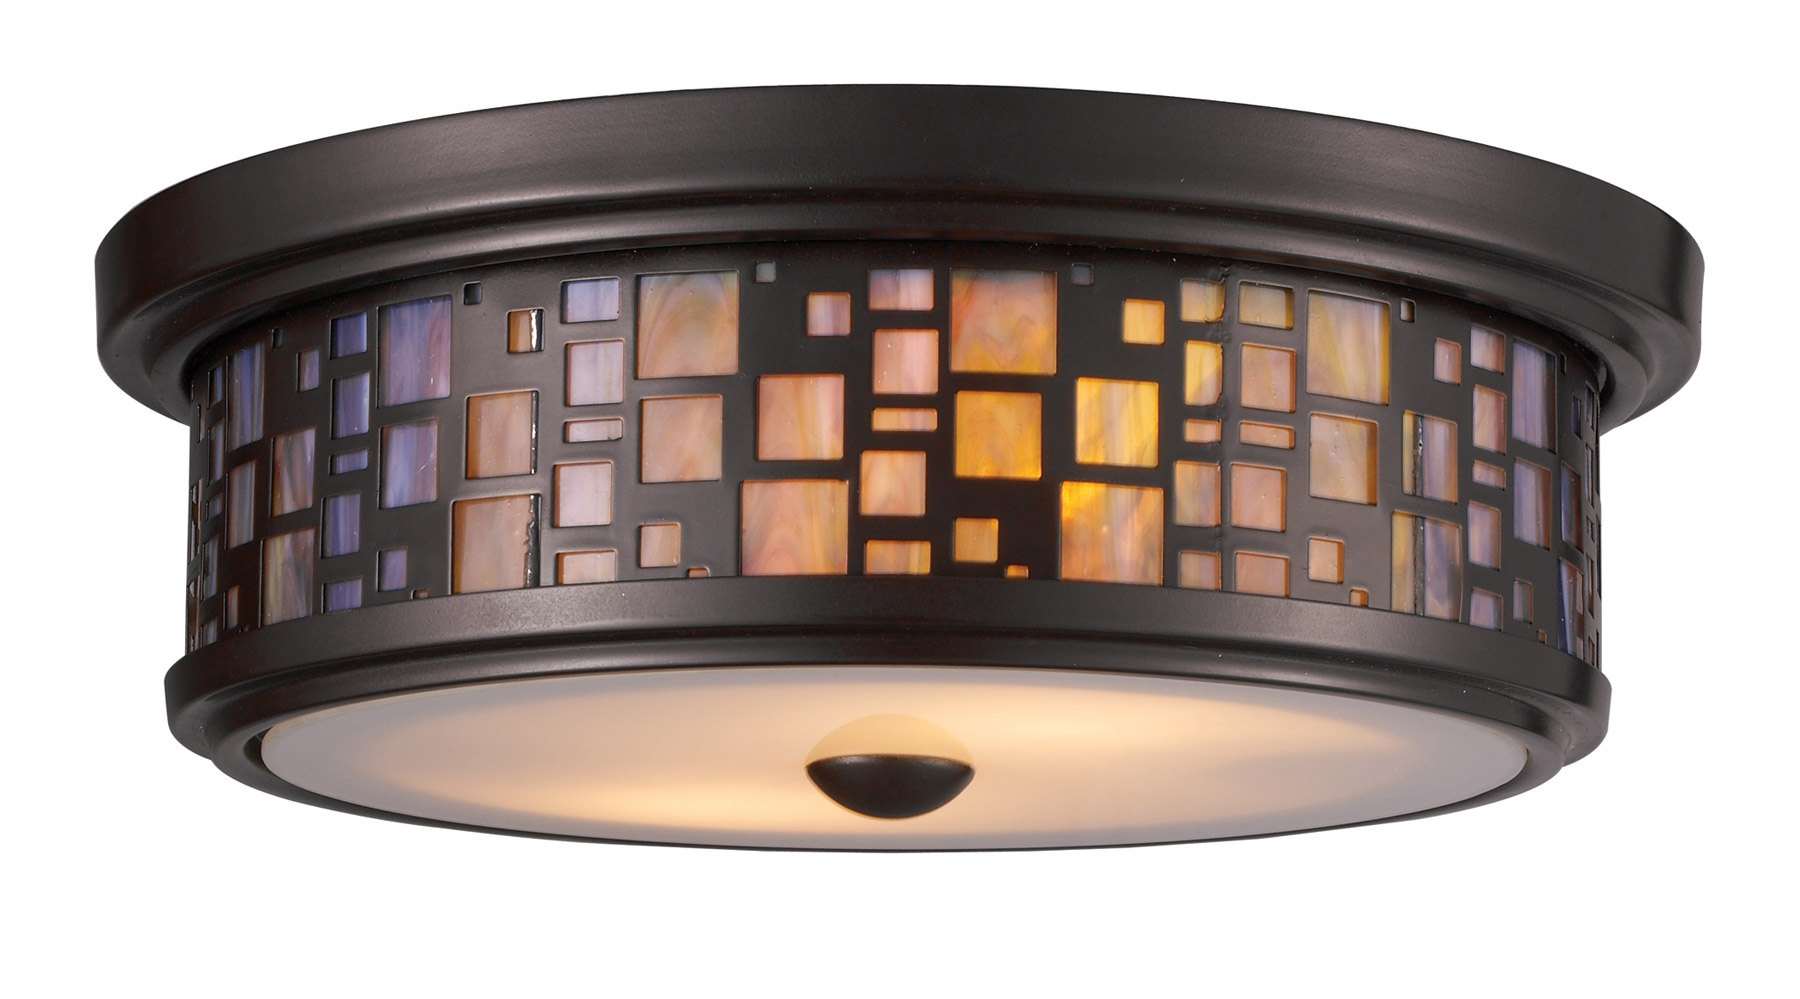 Bathroom Flush Ceiling Light Fixture Flush Mount Light: Elk Lighting 70027-2 Tiffany Flushes Flush Mount Ceiling